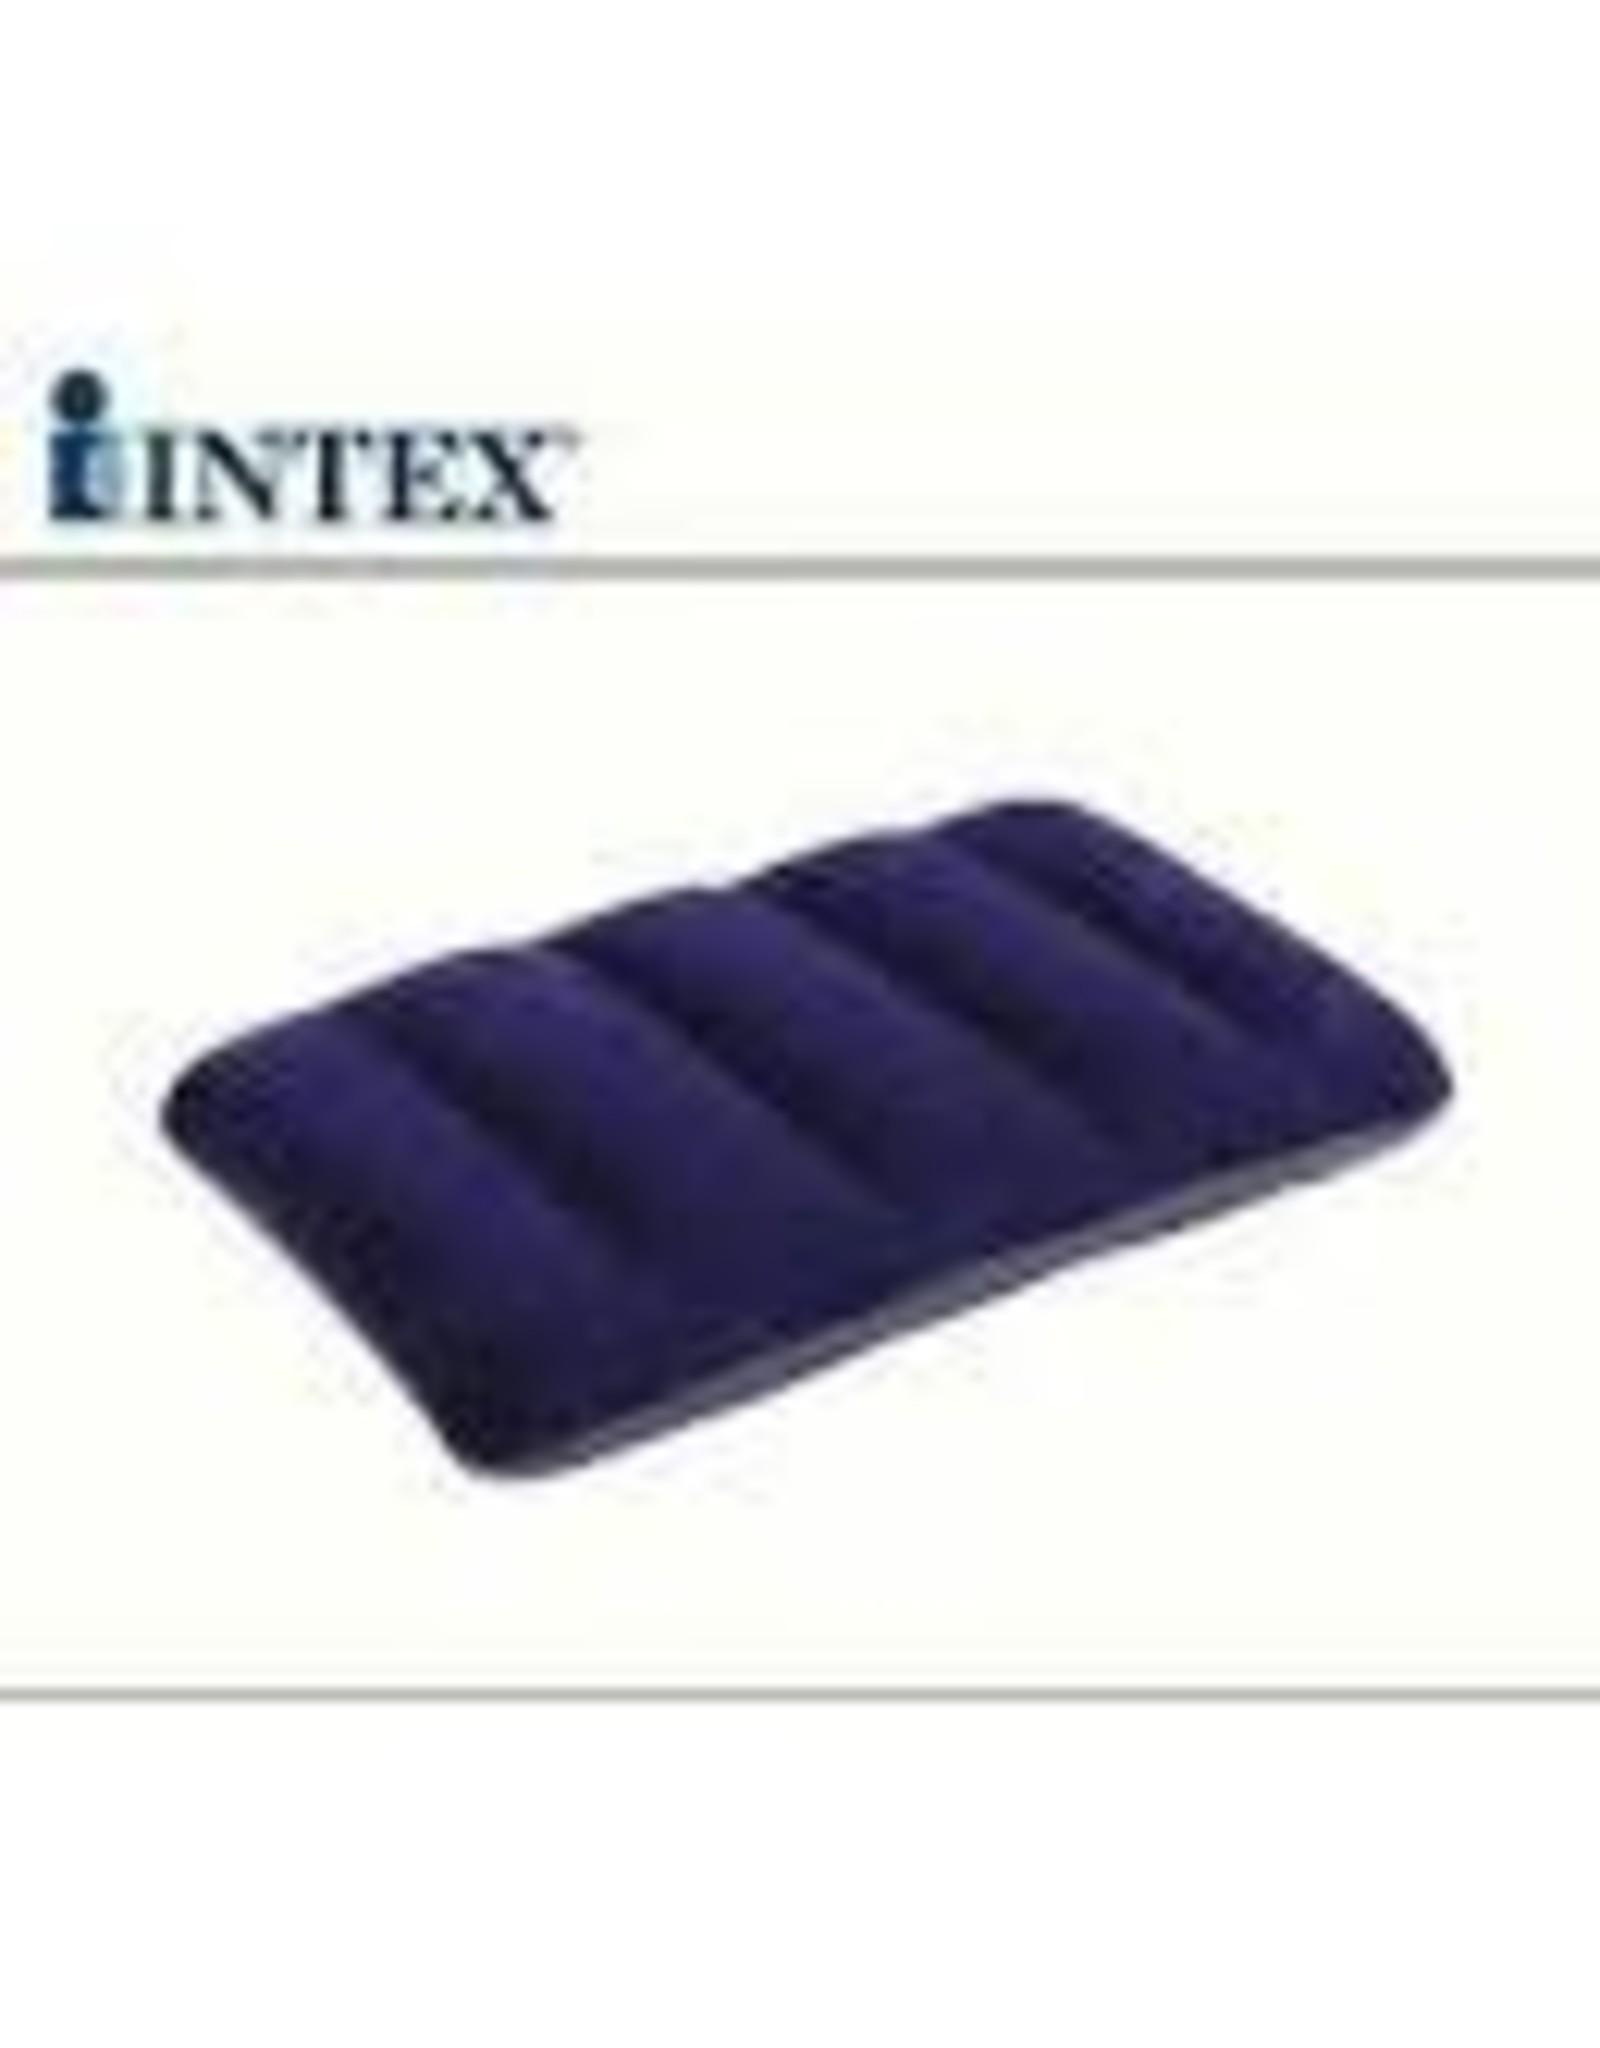 INTEX Intex Downy Pillow - Luchtkussen - 1-Persoons - 43x28x9 cm